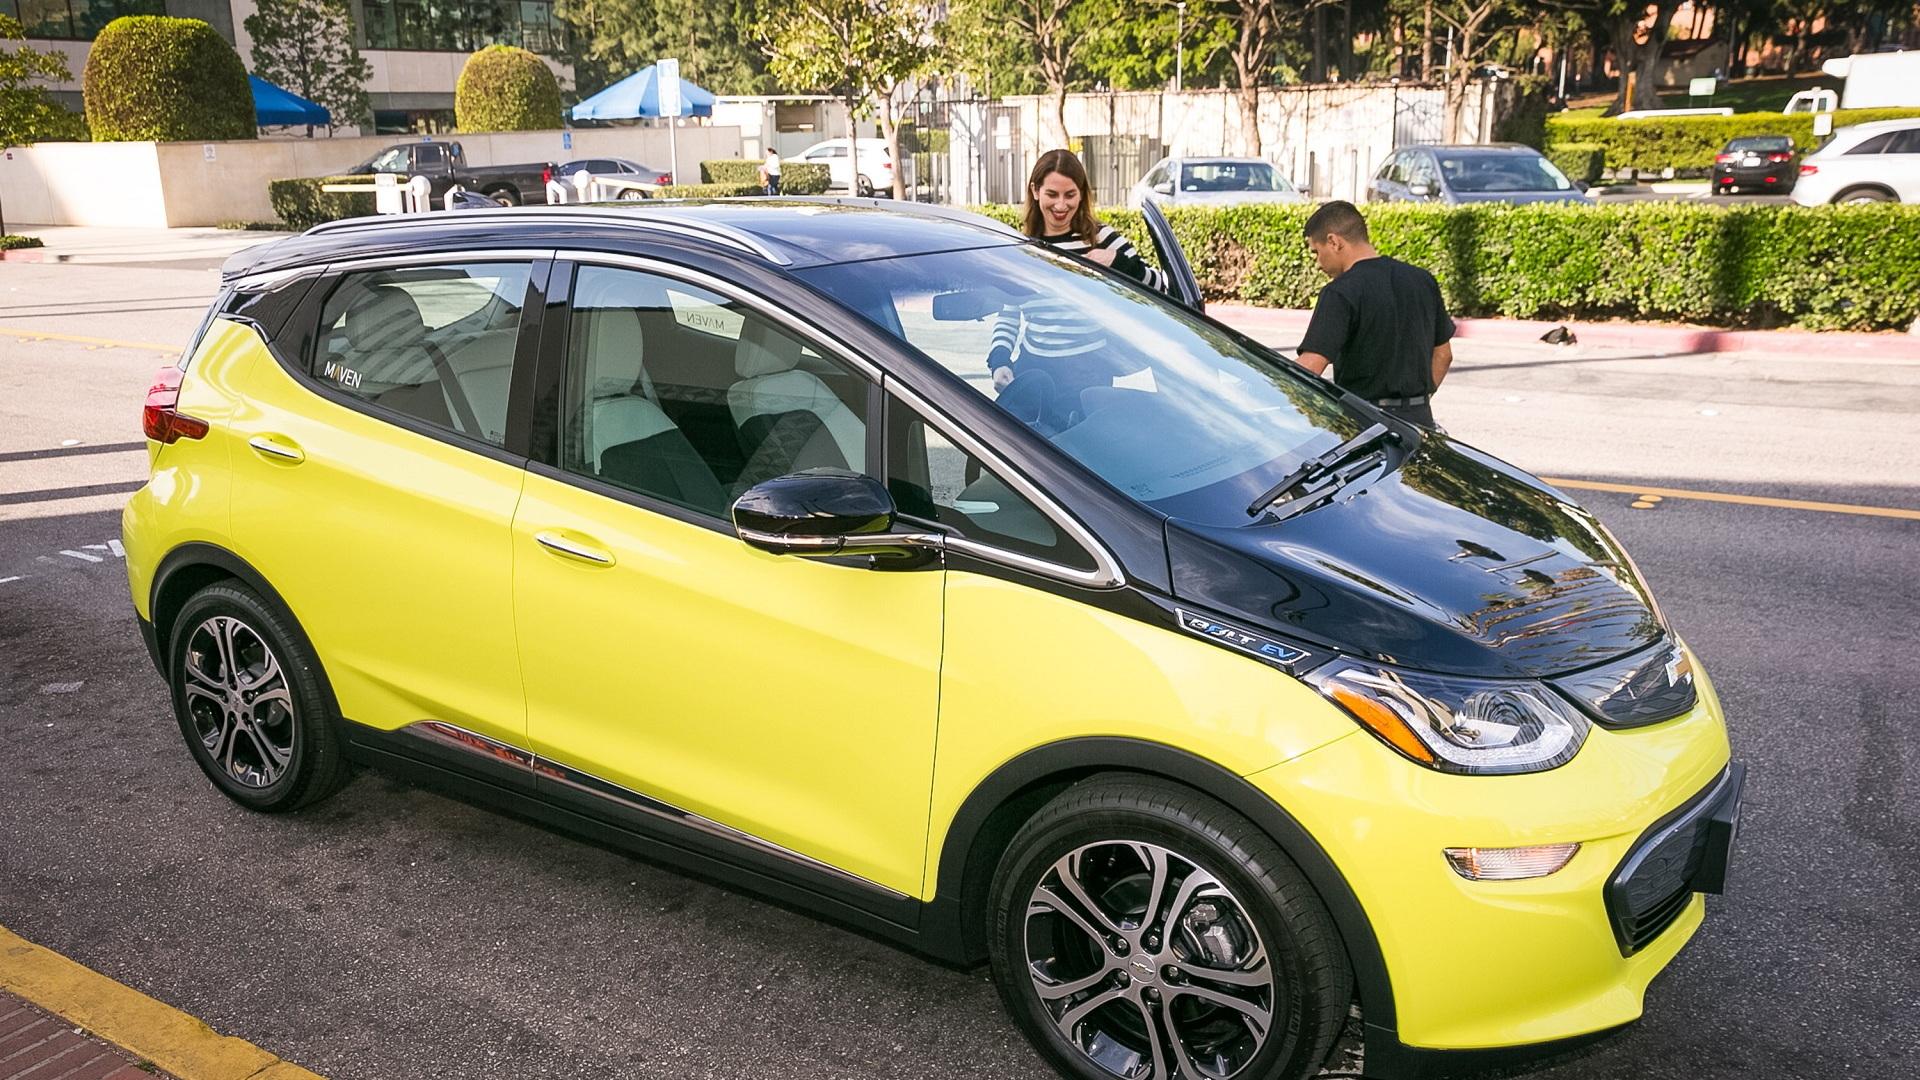 2017 Chevrolet Bolt EV electric car in Maven car-sharing fleet, Los Angeles [photo: Dan MacMedan fo